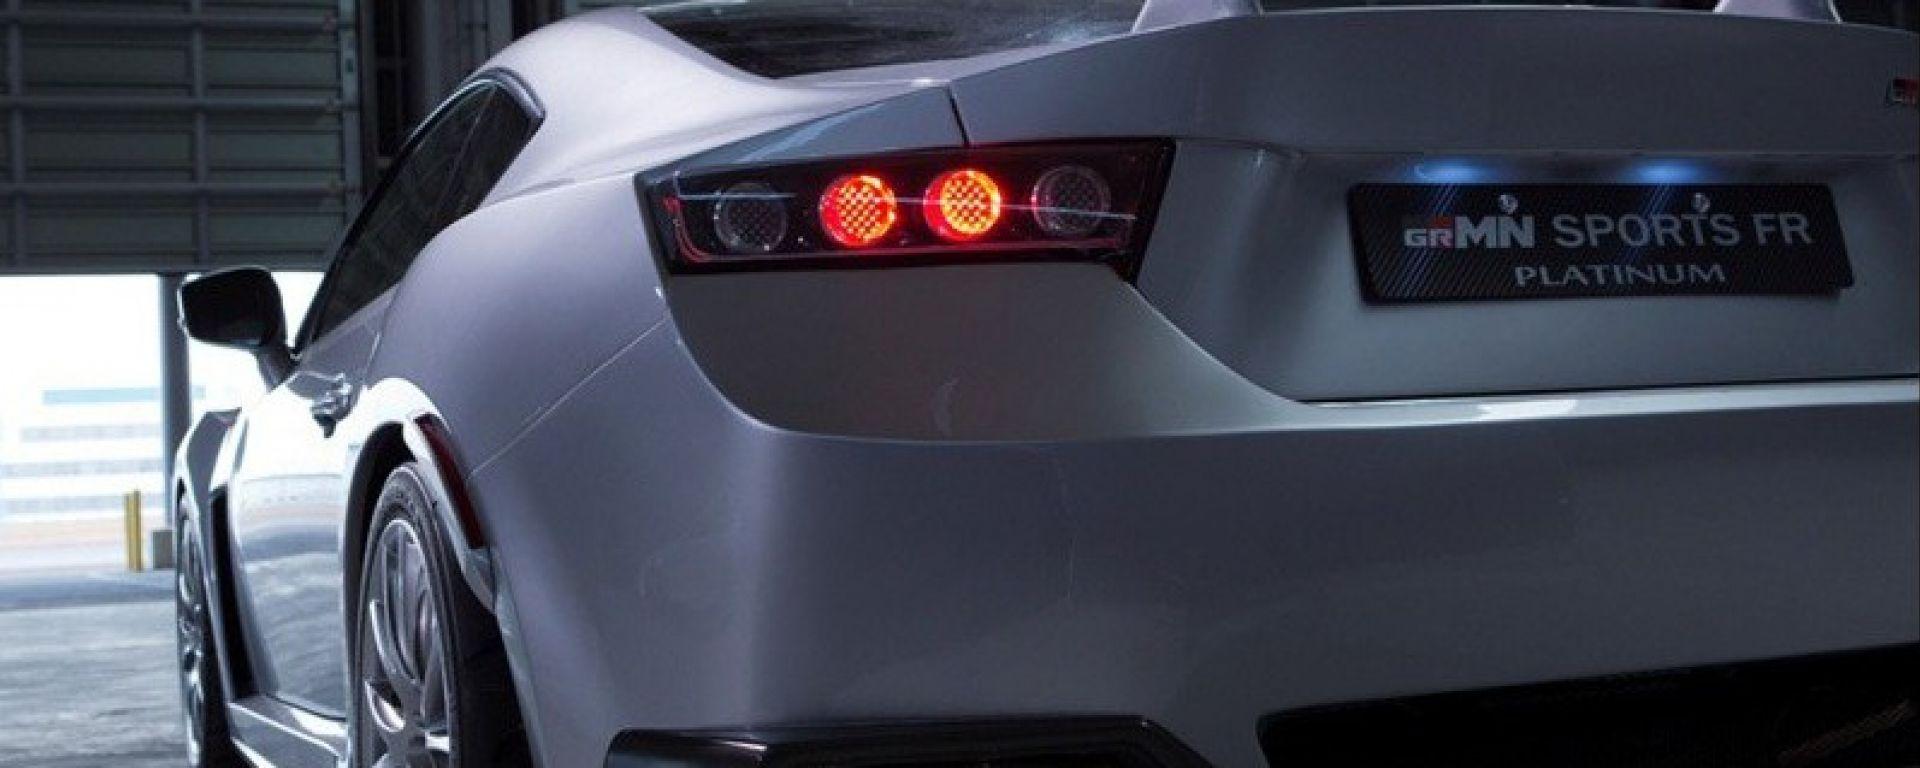 Toyota GT86 GRMN Sports FR Concept Platinum